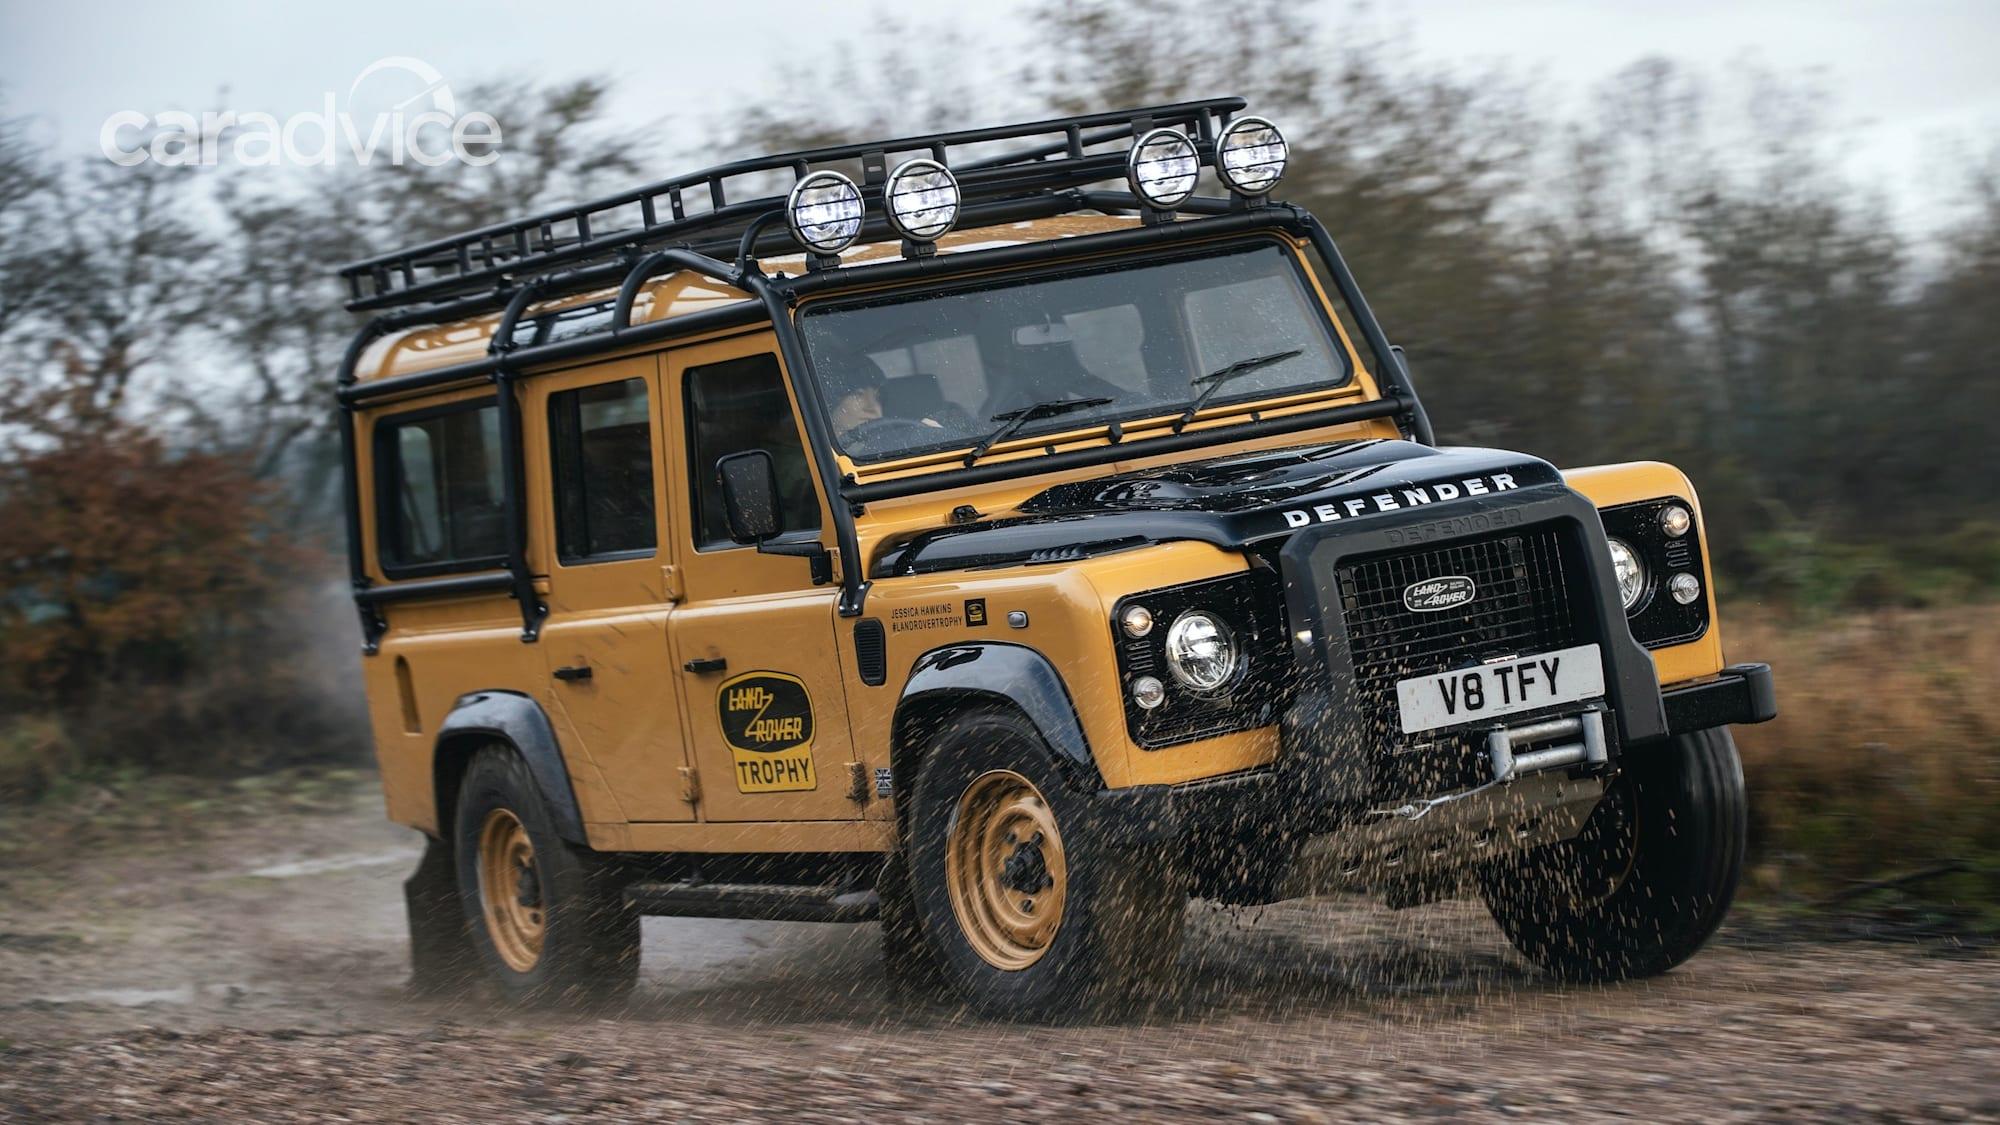 2021 Land Rover Defender Works V8 Trophy unveiled: Classic ...